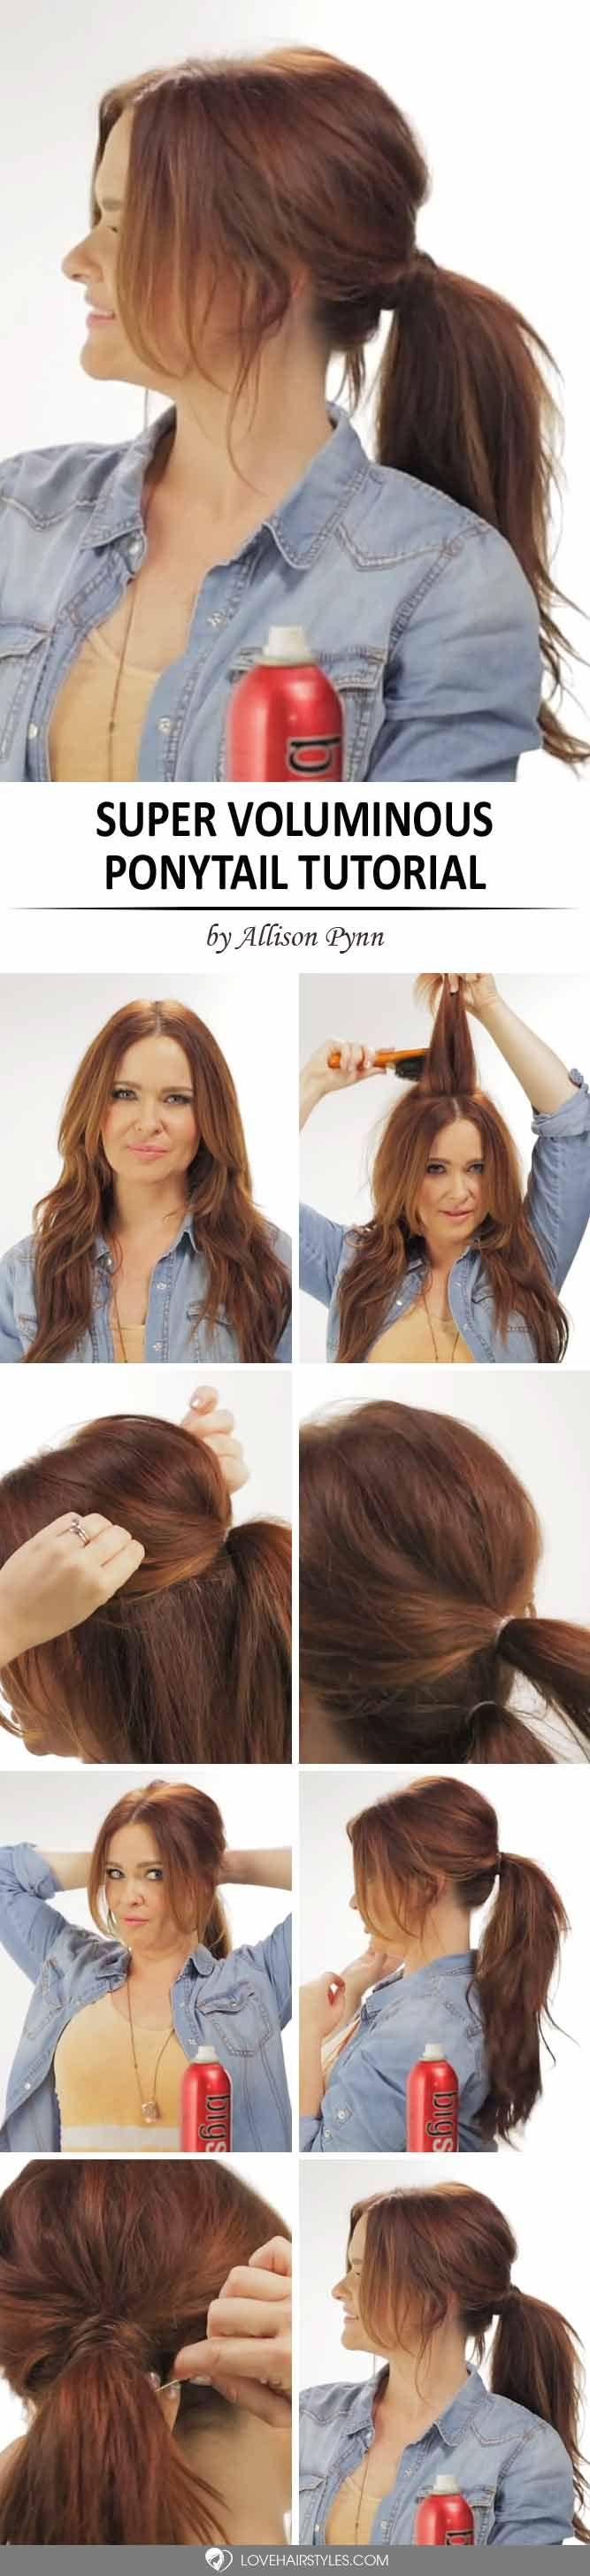 Pleasant 1000 Ideas About Easy Ponytail Hairstyles On Pinterest Ponytail Short Hairstyles Gunalazisus